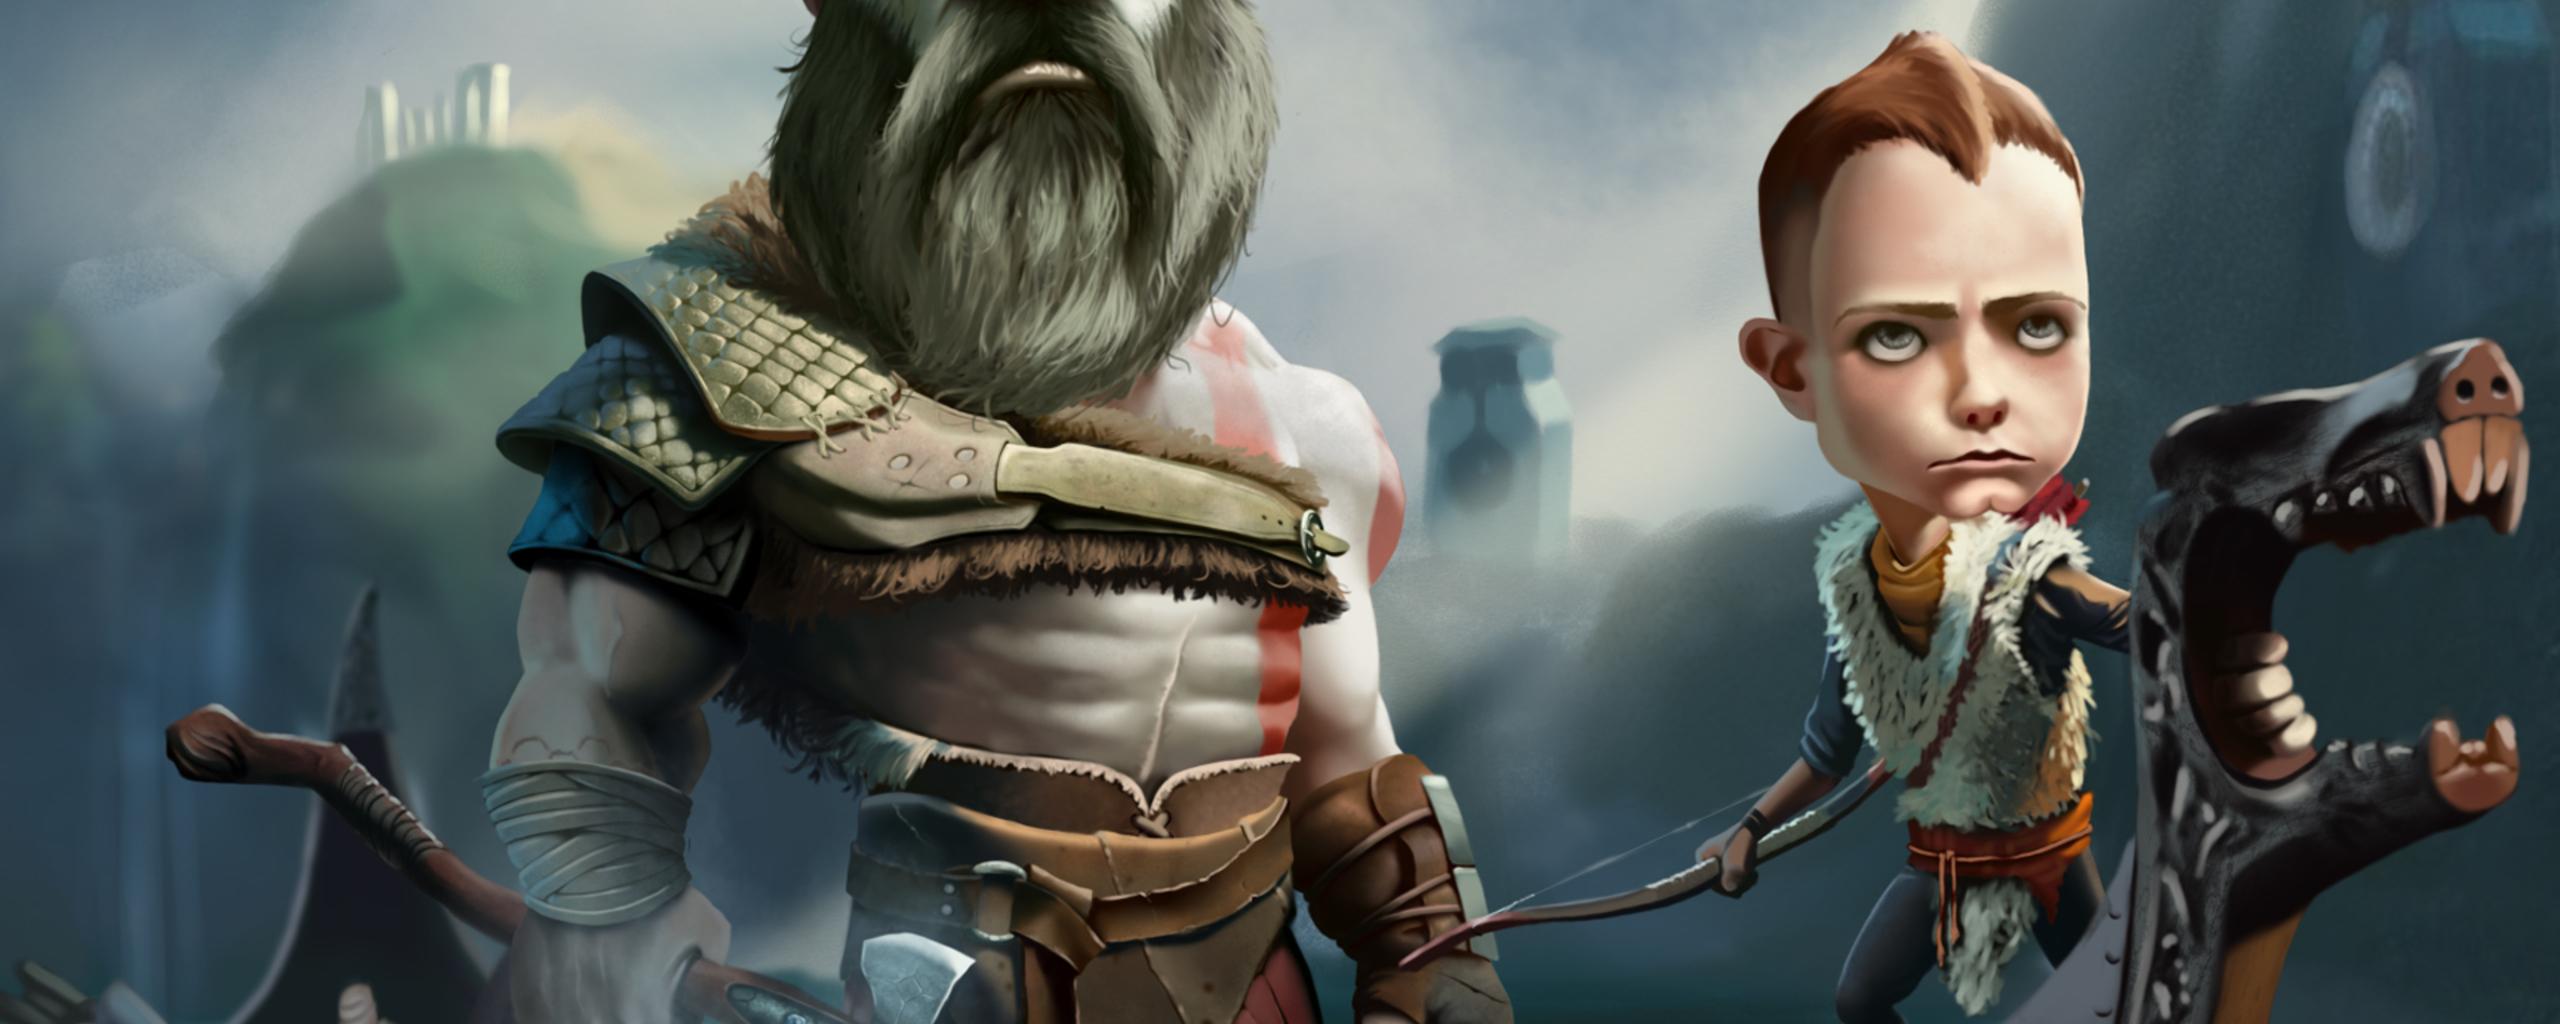 god-of-war-artwork-l1.jpg